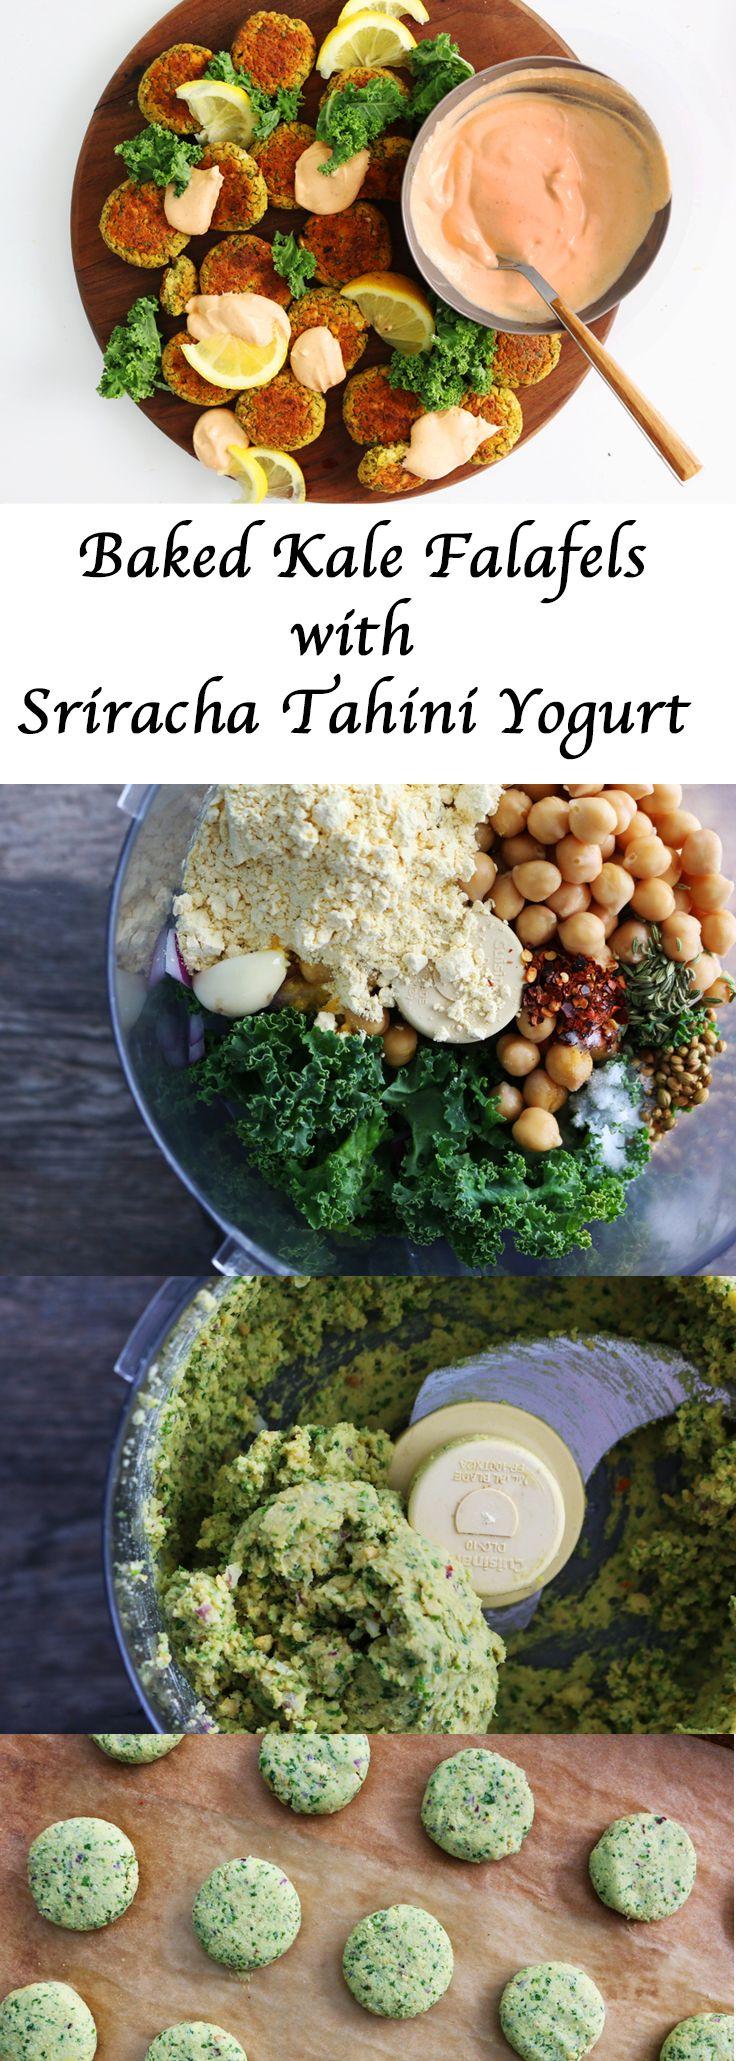 #appetizer #snack #healthysnack #dinner #lunch #lunchbox #pita #falafel #kale #bakedfalafel #healthy #kalefalafel #greekyogurt #sriracha #tahini #cleaneating #eatclean http://www.kitchenathoskins.com/2017/03/21/baked-kale-falafels-with-sriracha-tahini-yogurt/